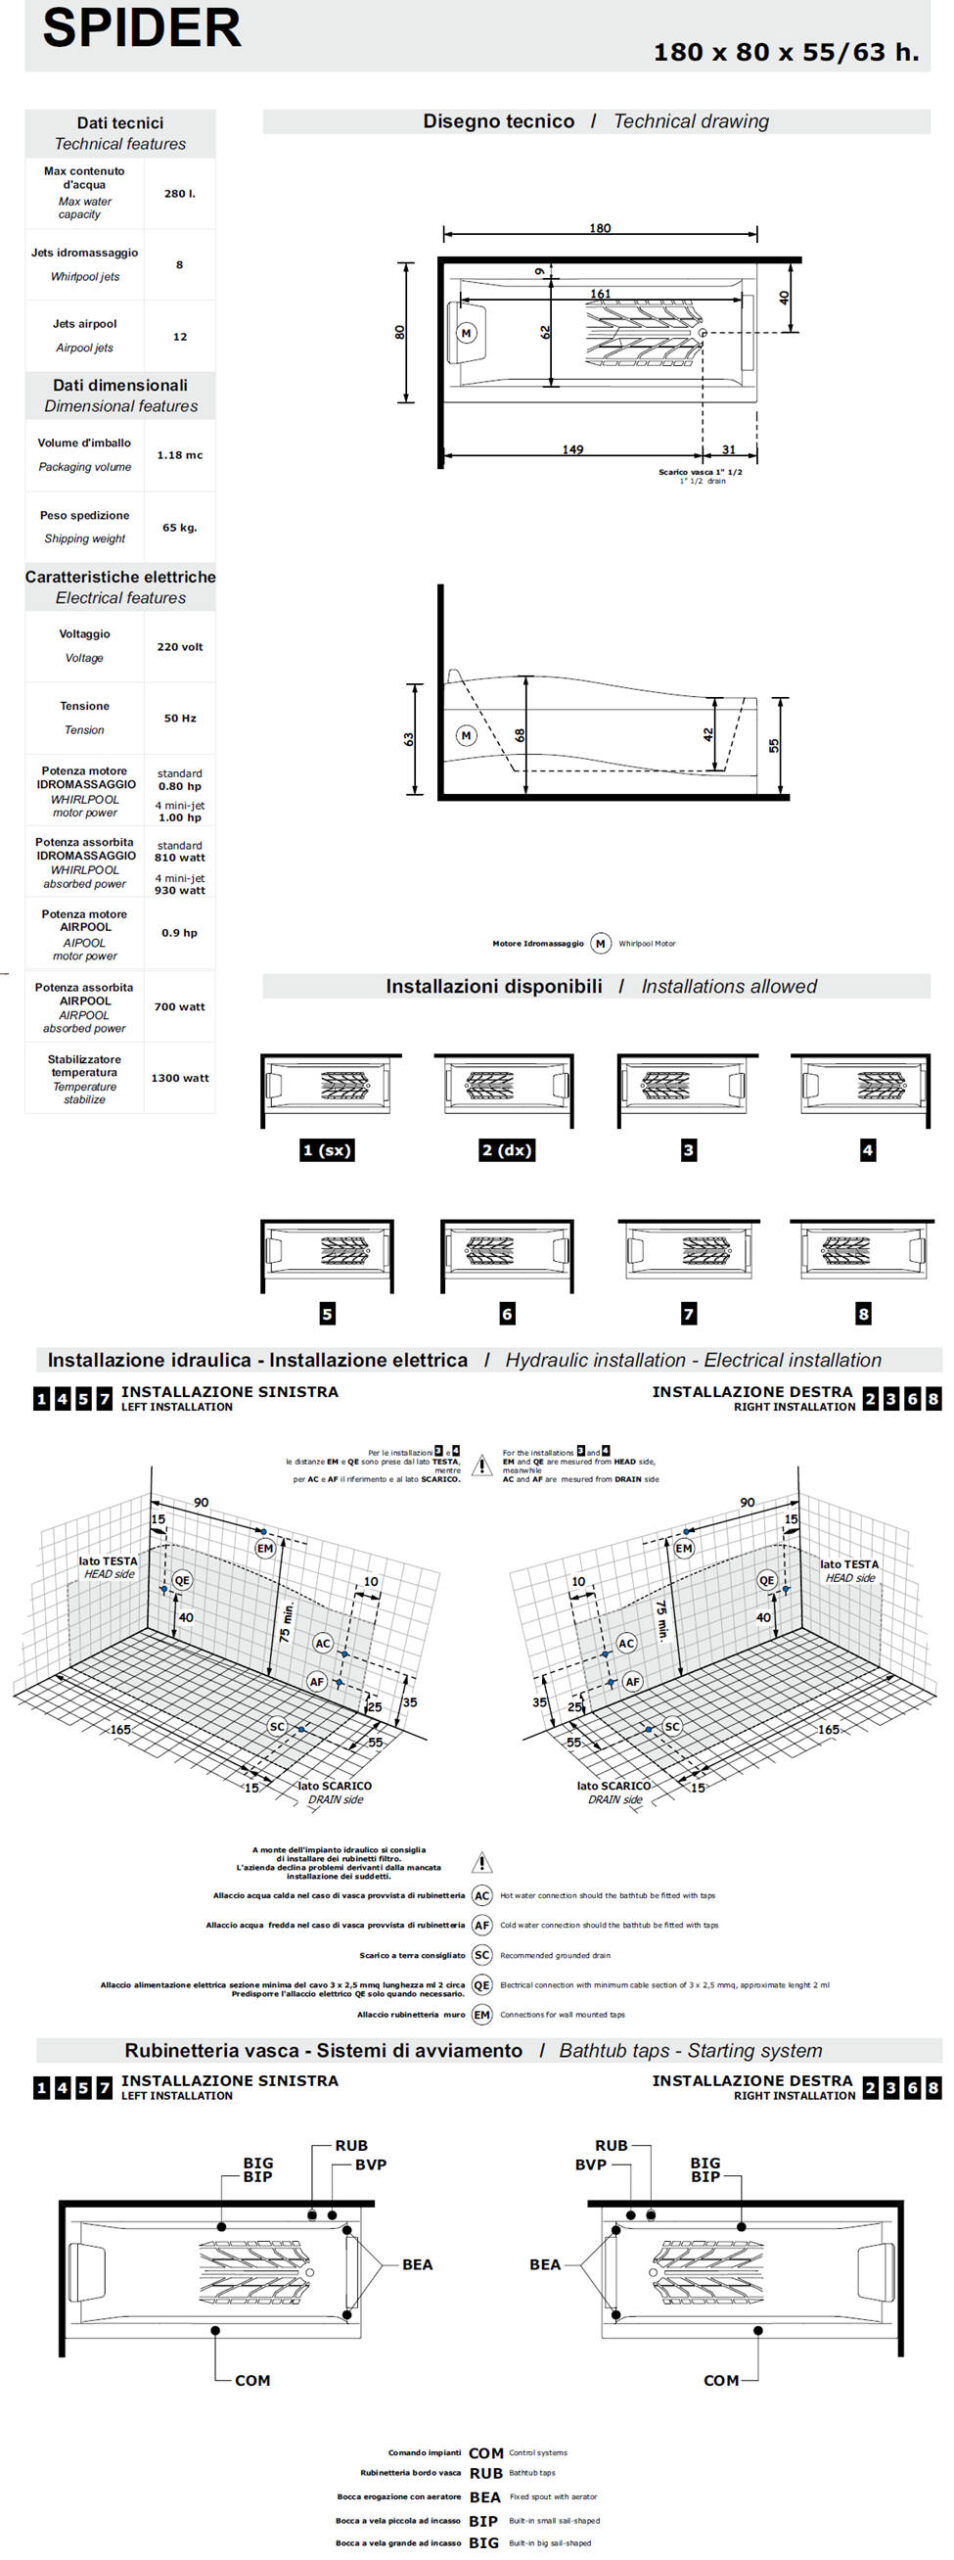 data sheet whirlpool bathtub spider treesse